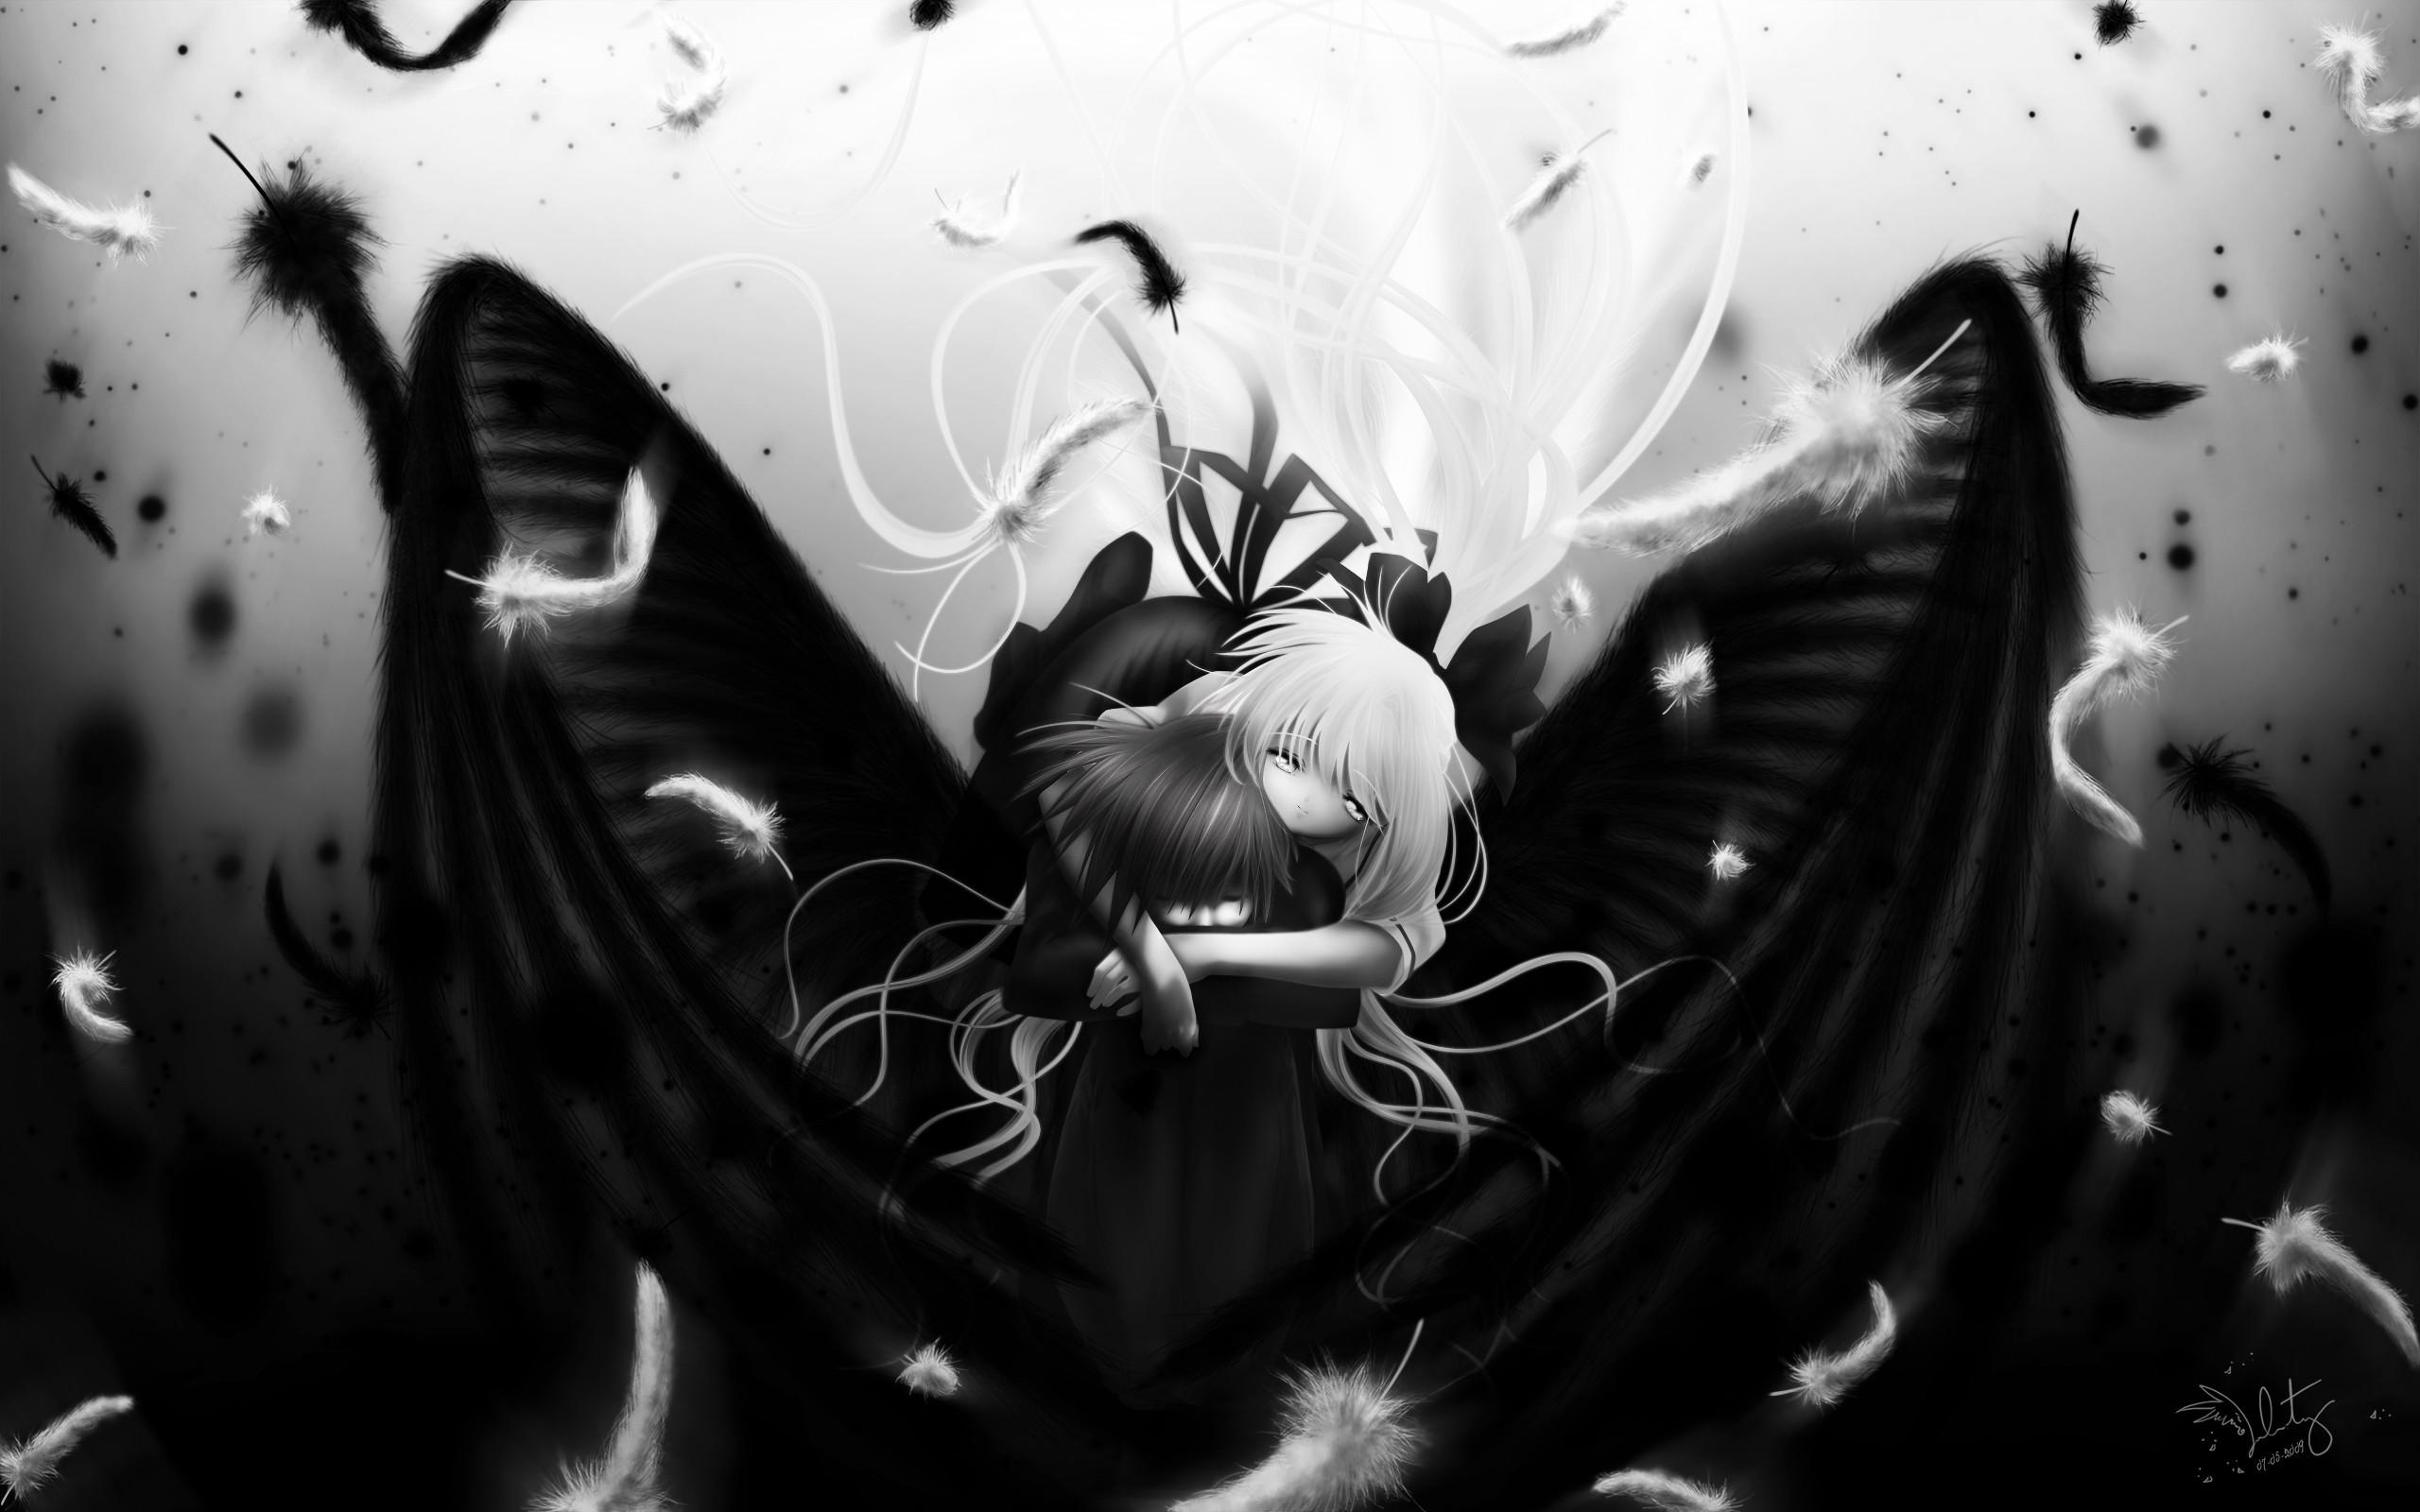 Anime Boy Air Monochrome Angel Black Cute Girl Kamio 1033546 Wallpaper  wallpaper